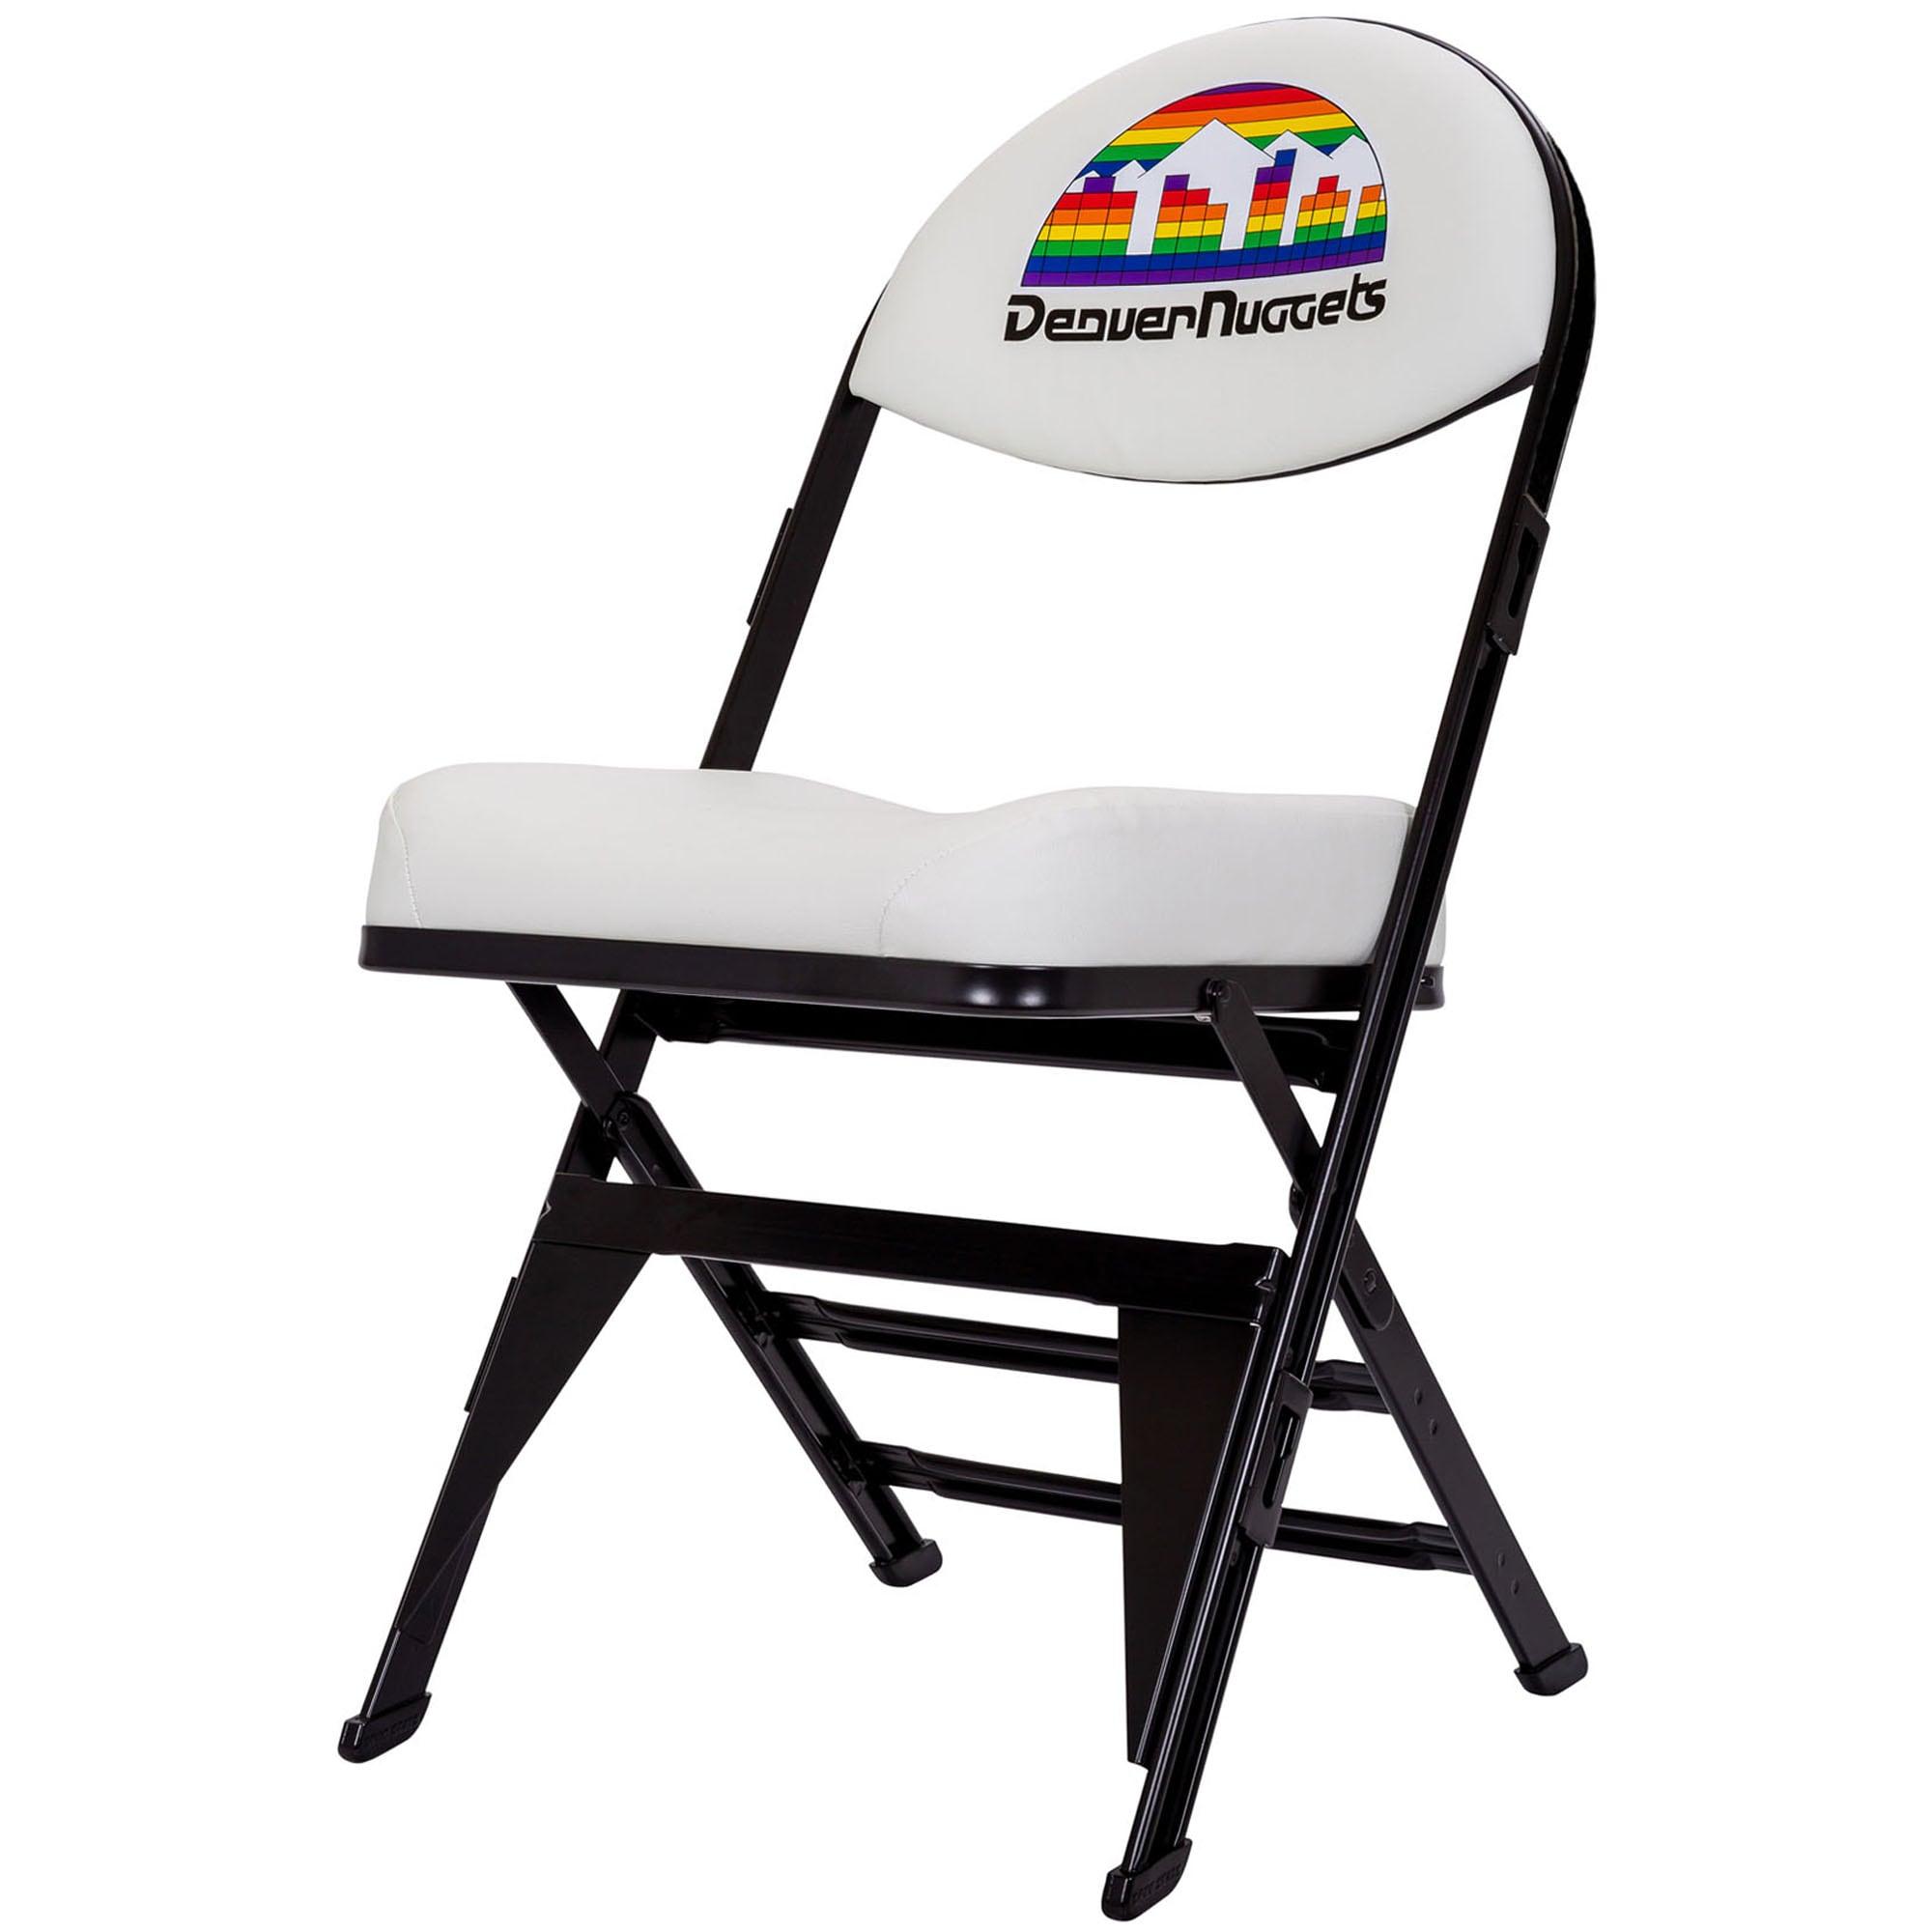 Denver Nuggets Retro Chair - White